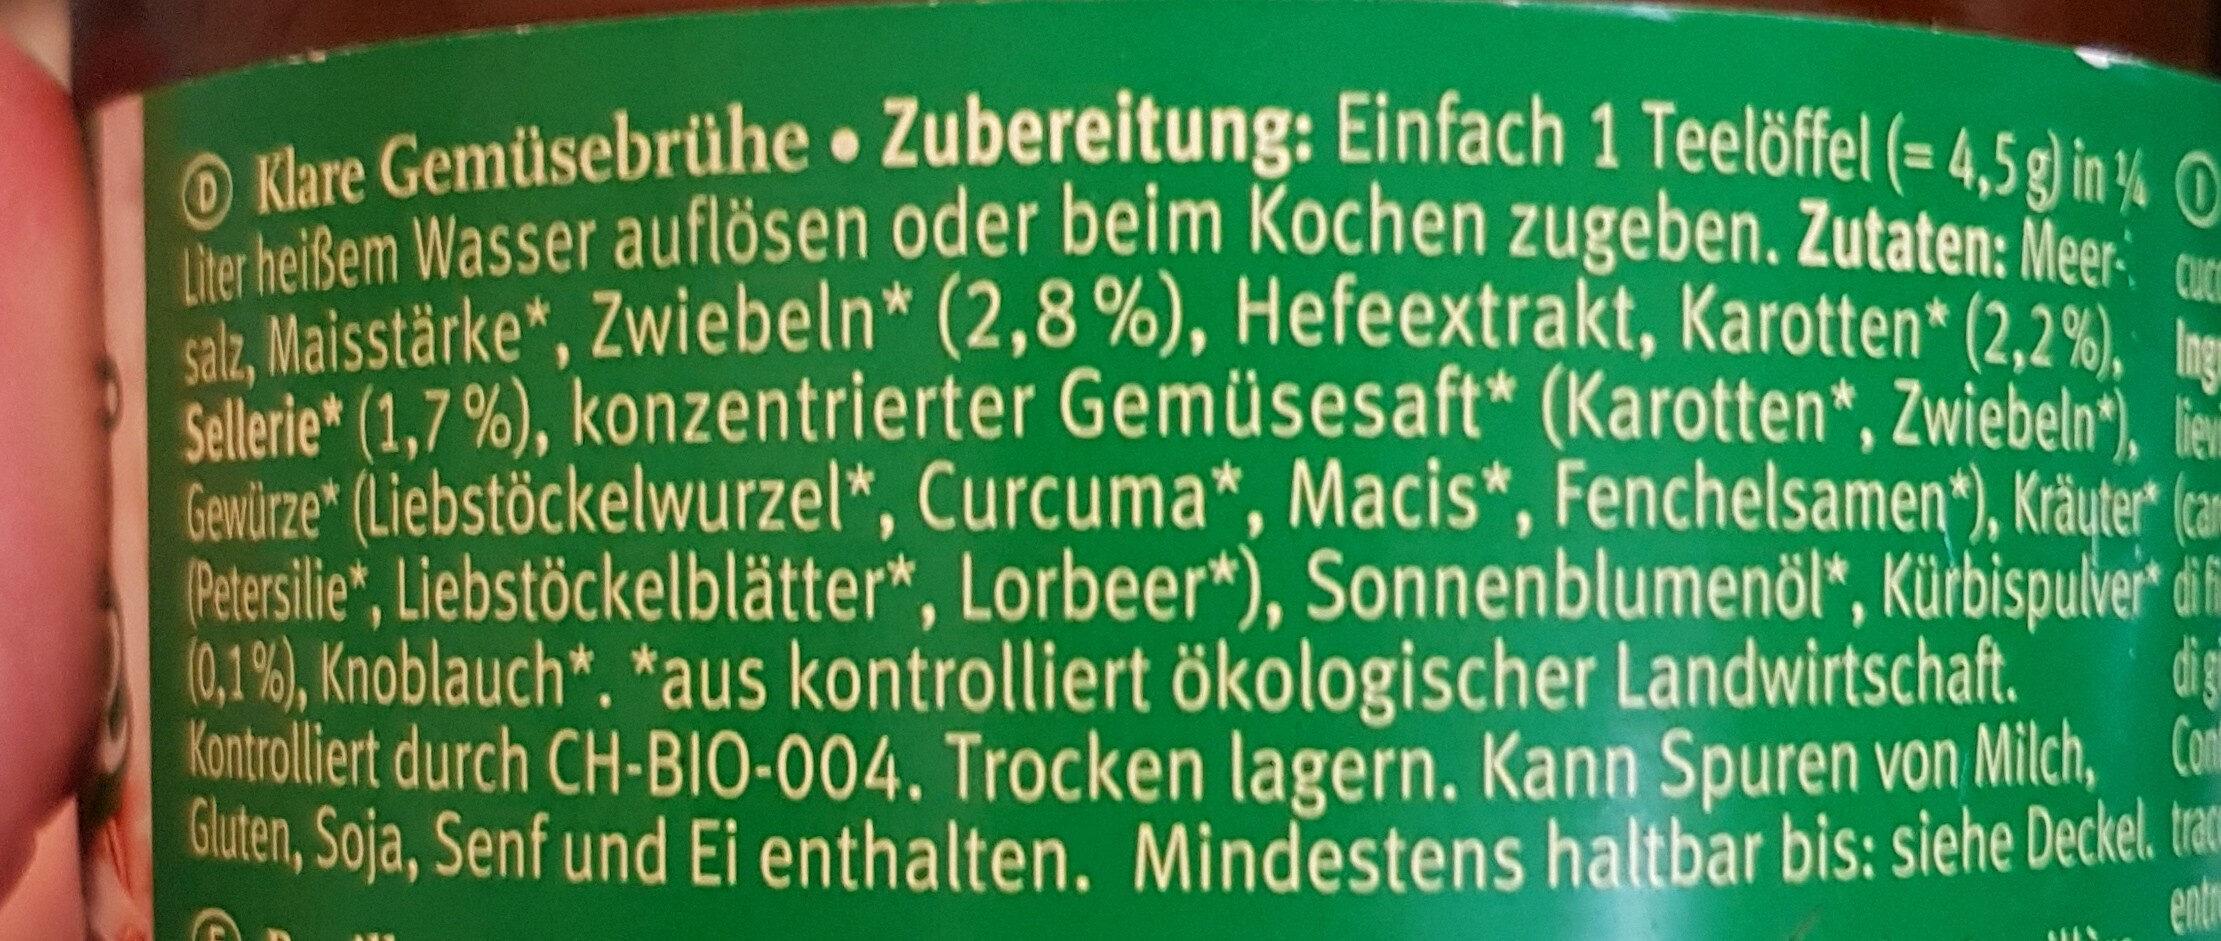 klare Gemüsebrühe zum Würzen - Ingredients - en